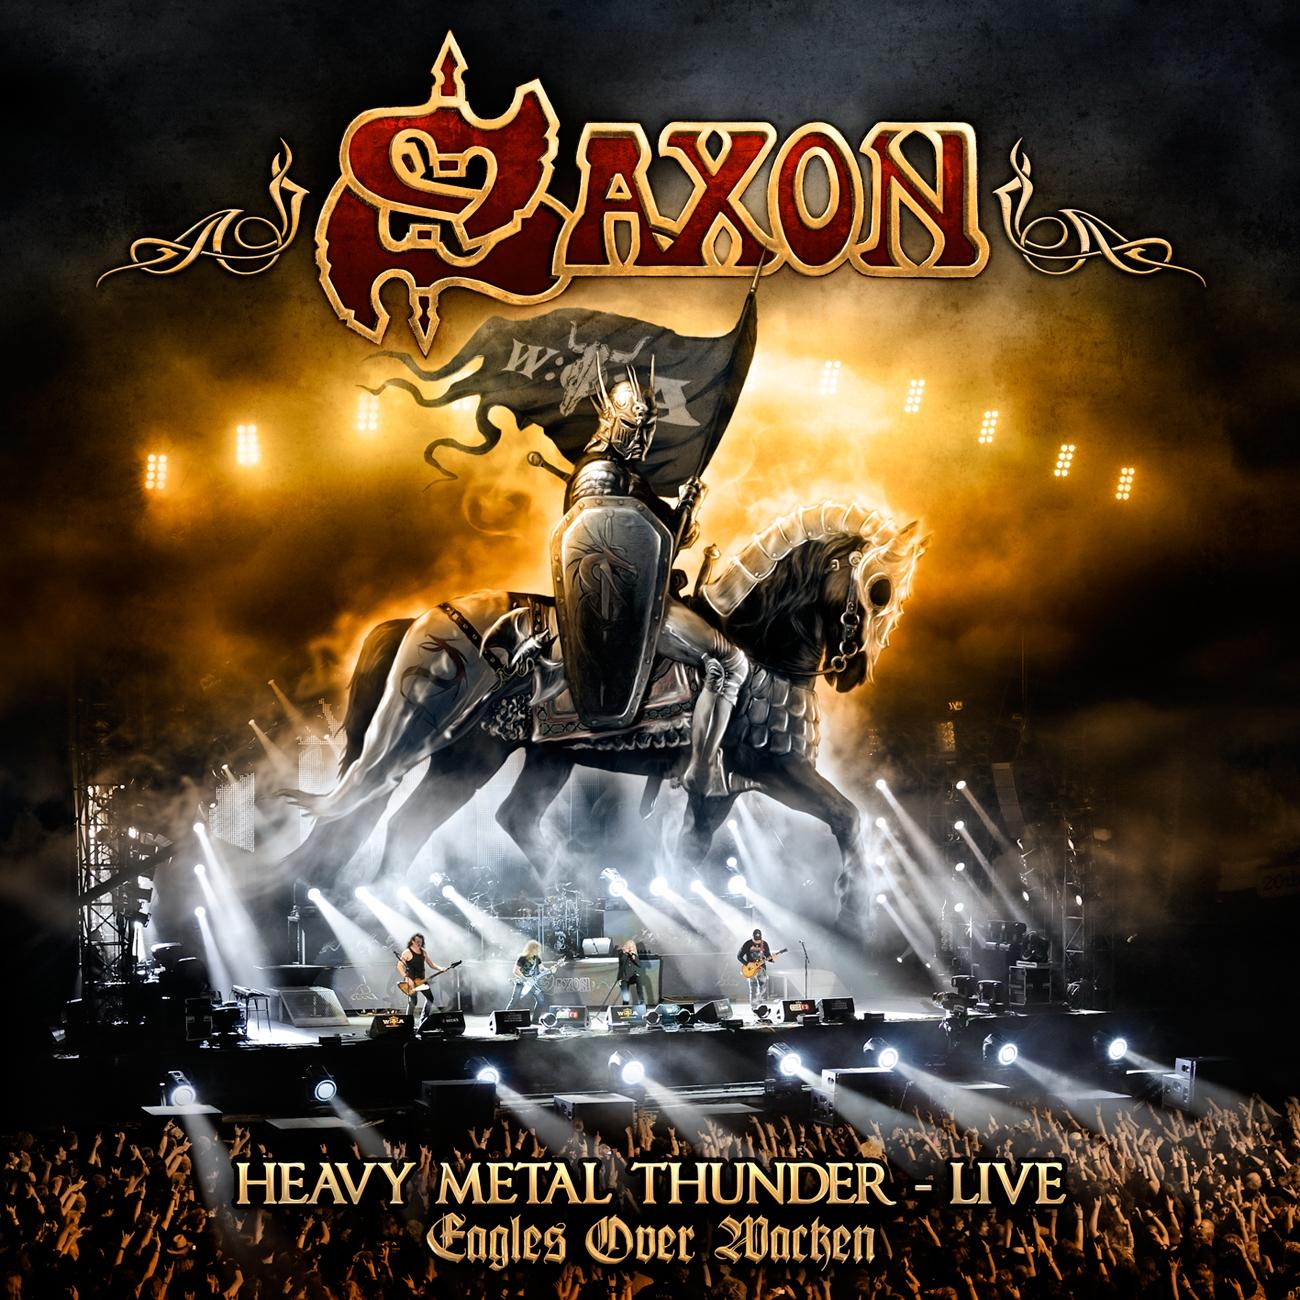 Saxon: Heavy Metal Thunder - Live - Eagles Over Wacken